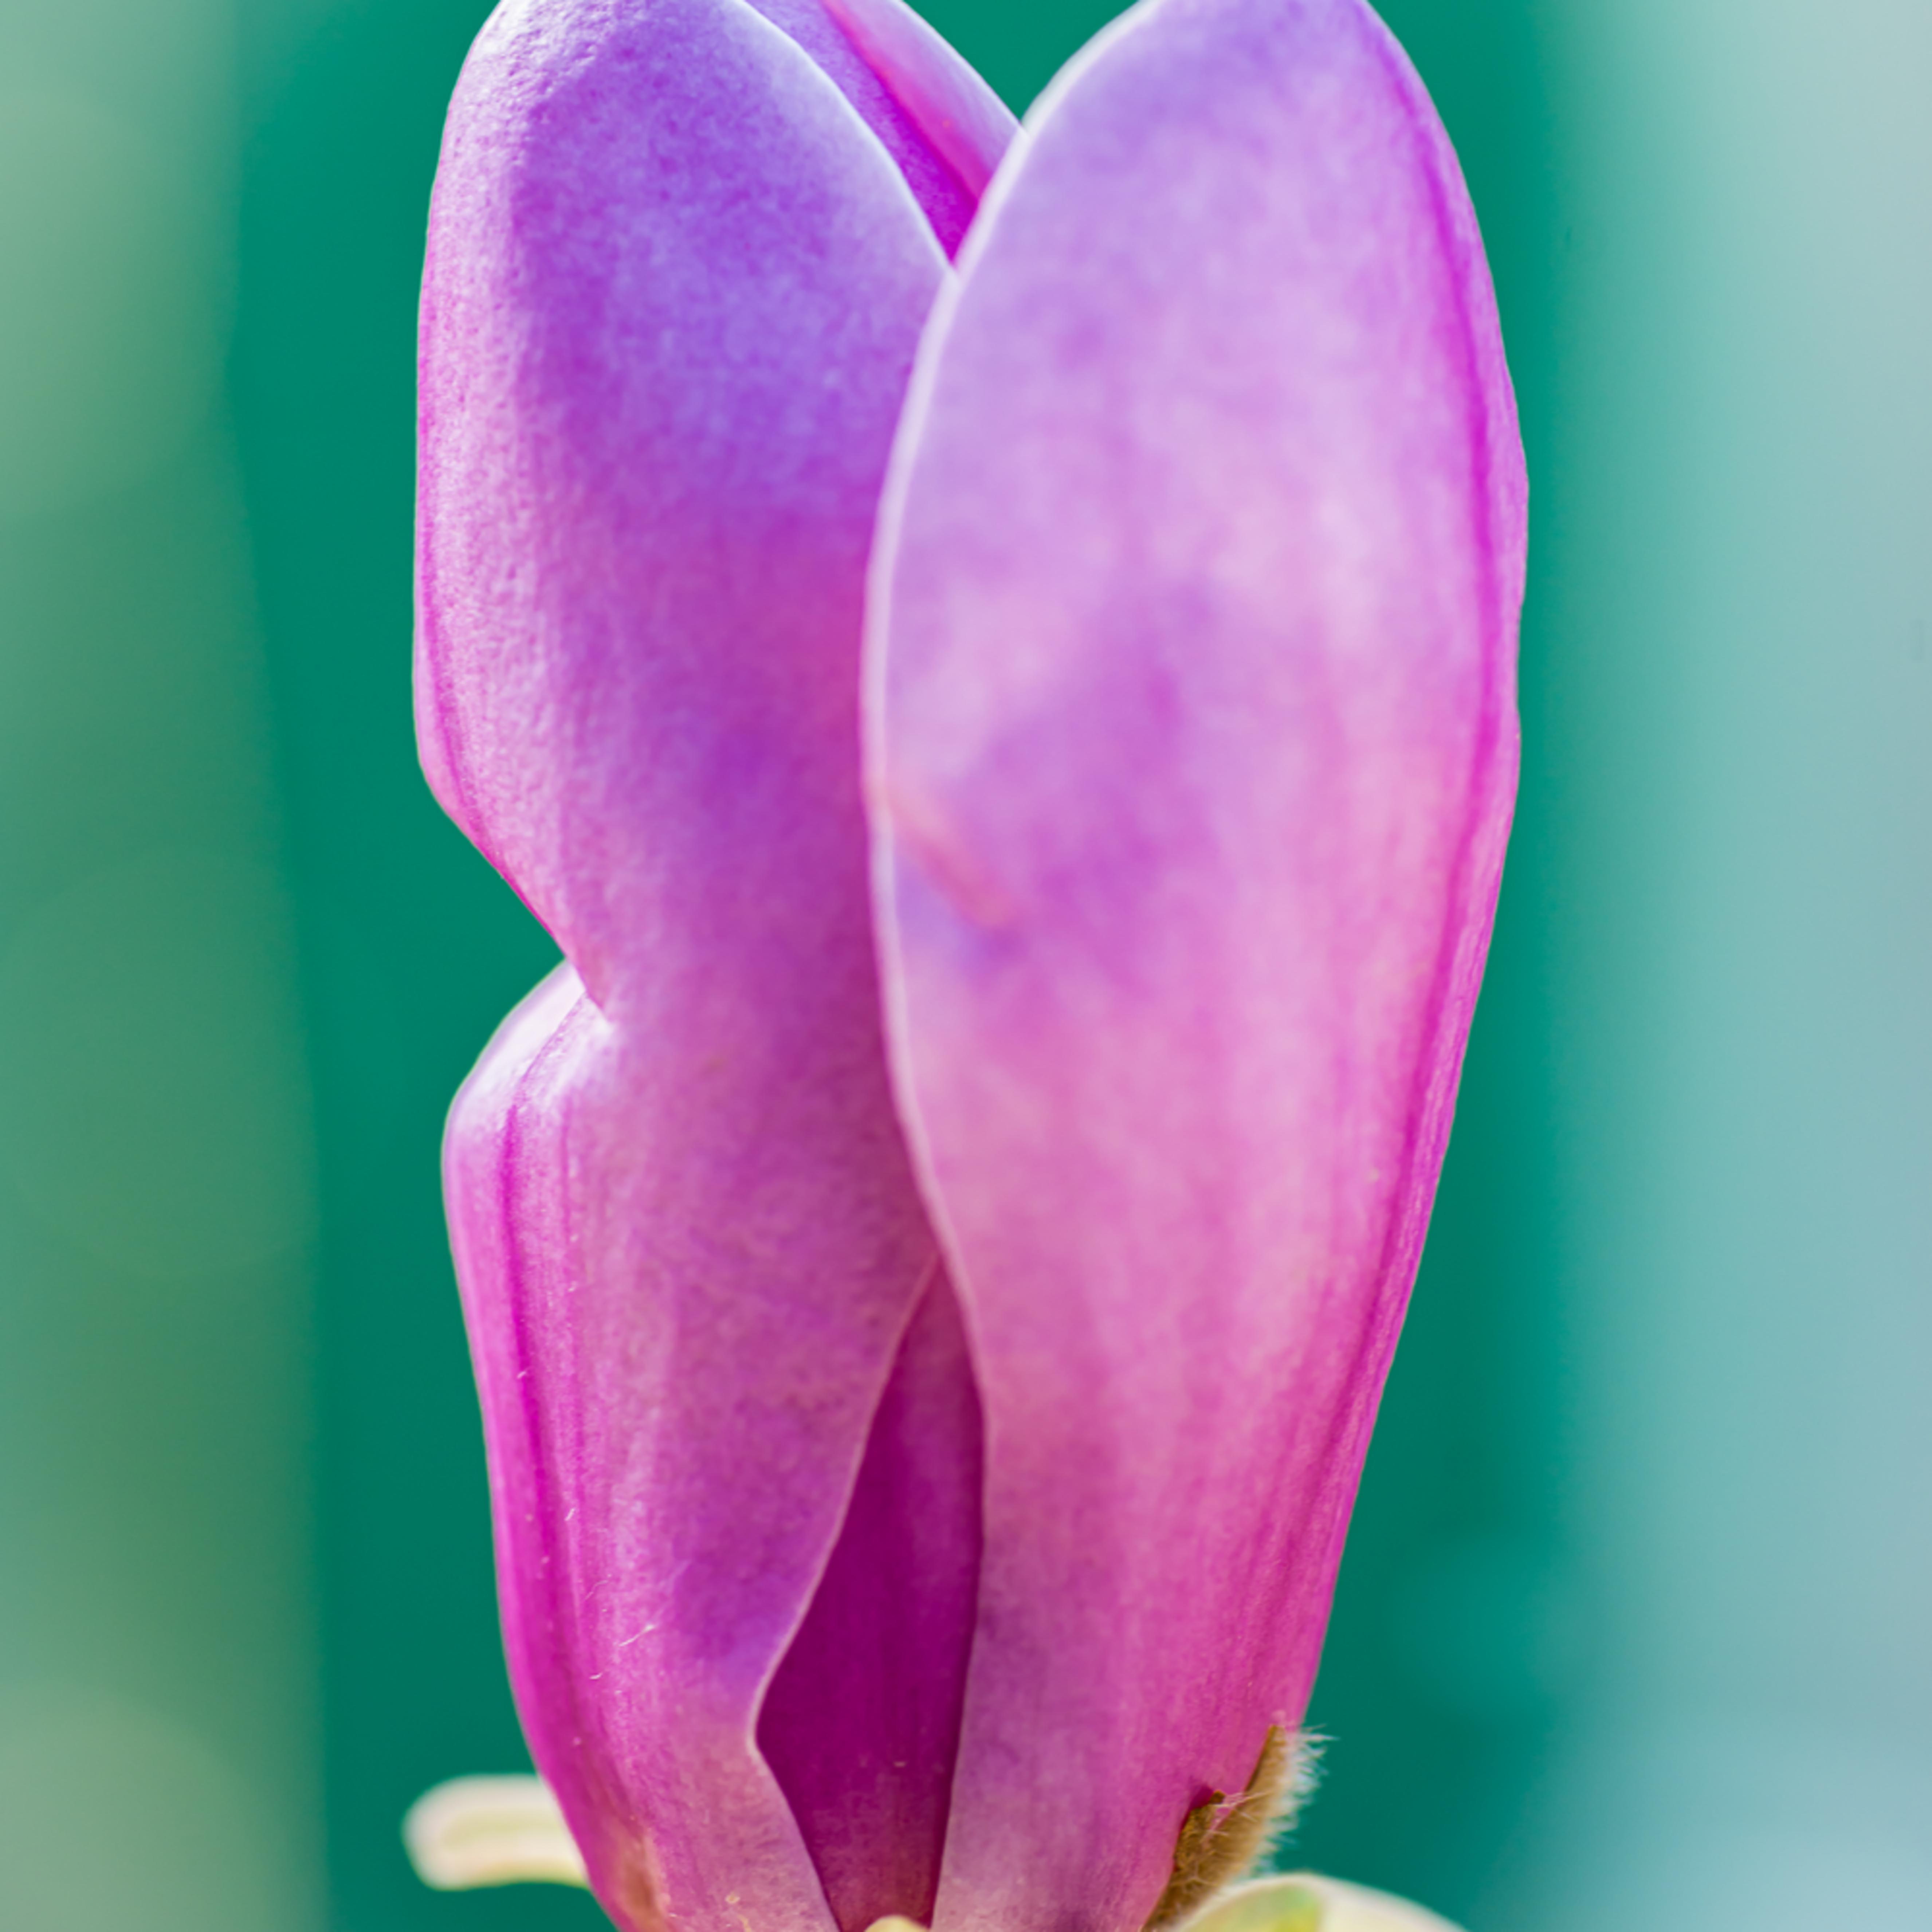 2017 april flowers55 gfweww